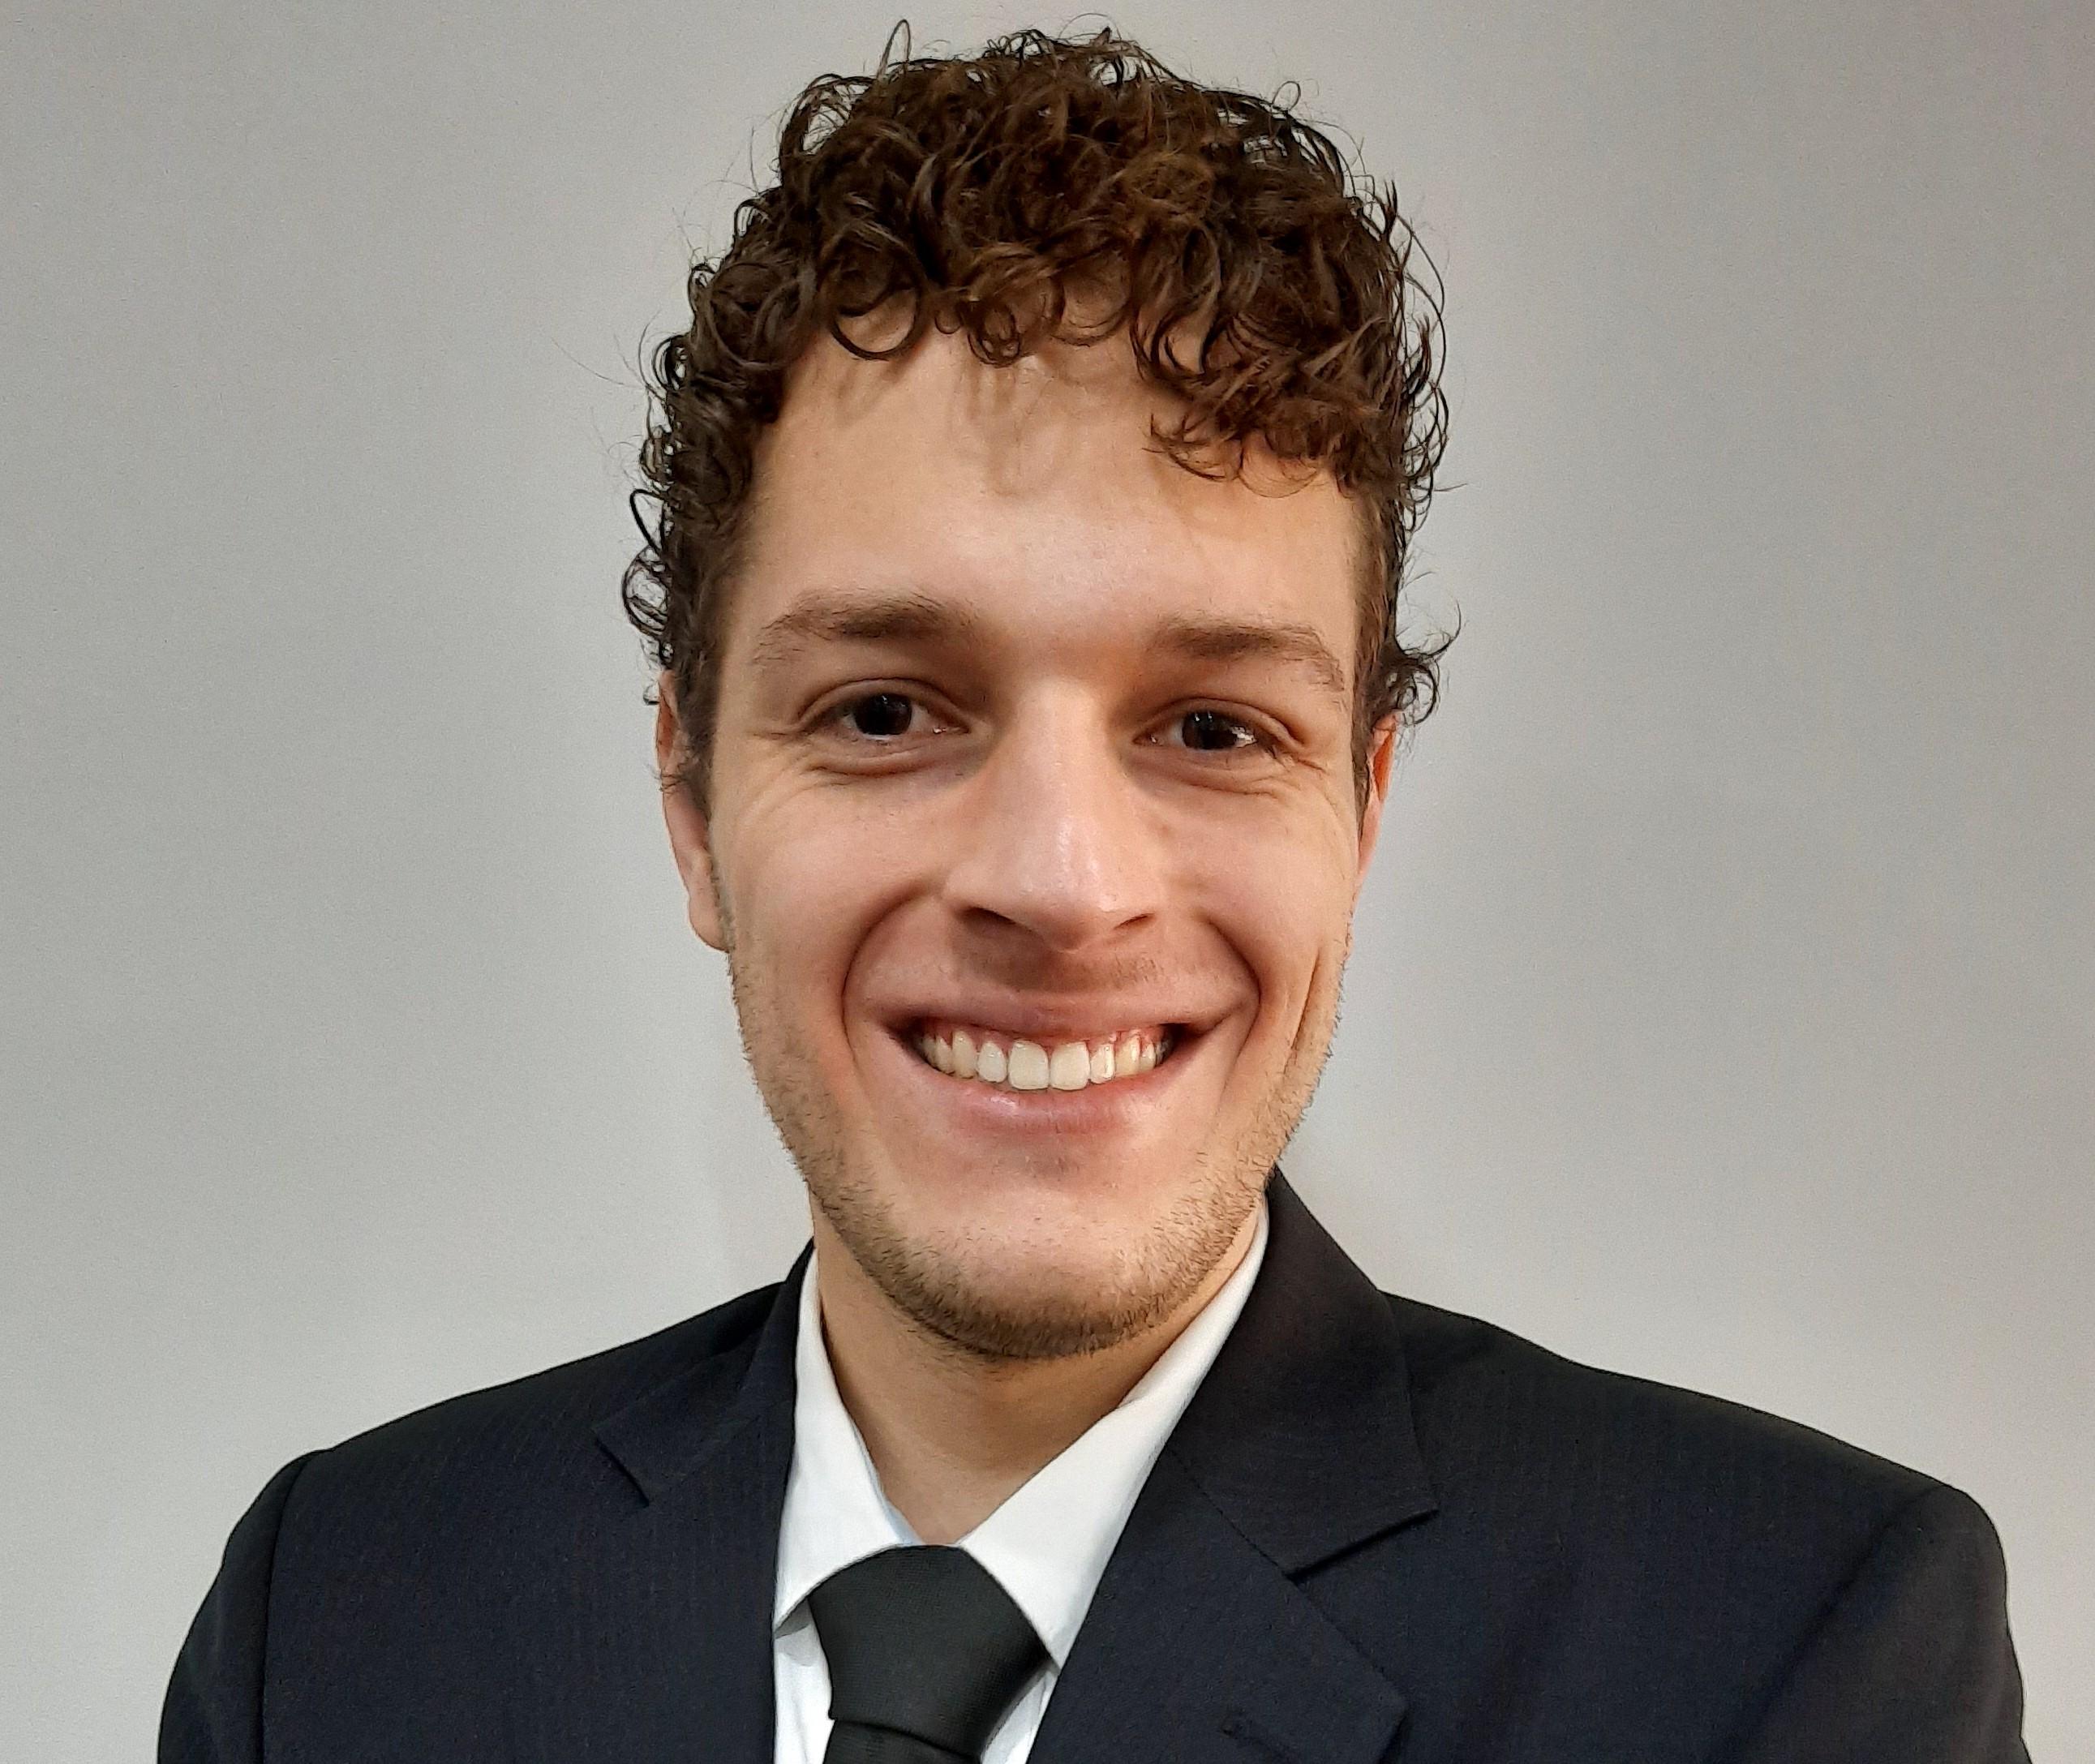 Lukas Goncalves